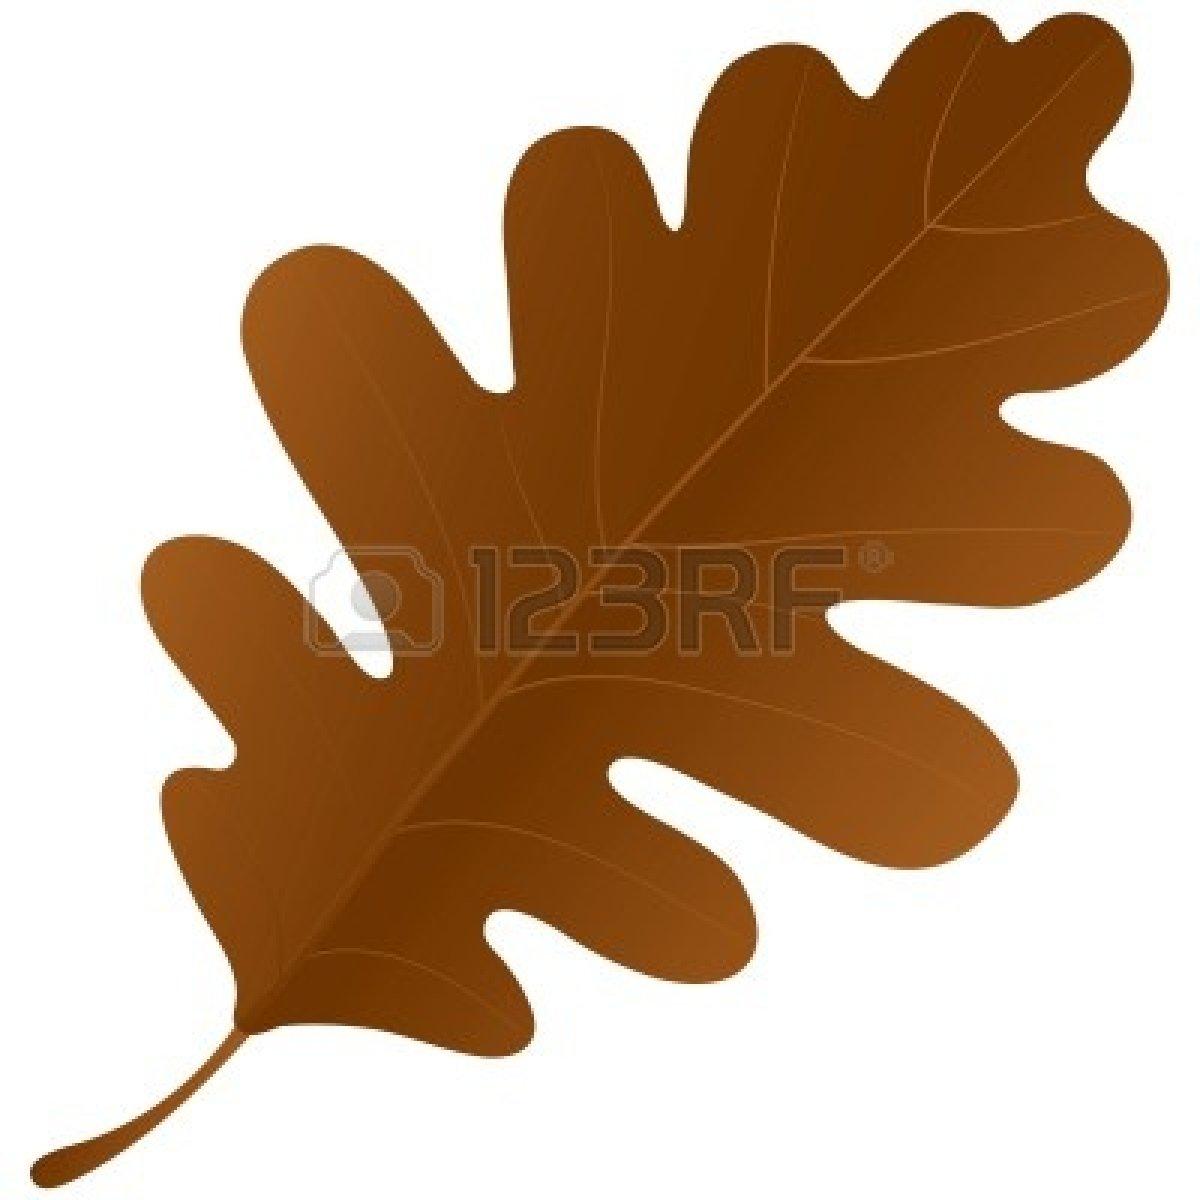 1200x1200 Leaves Clipart Brown Leaf